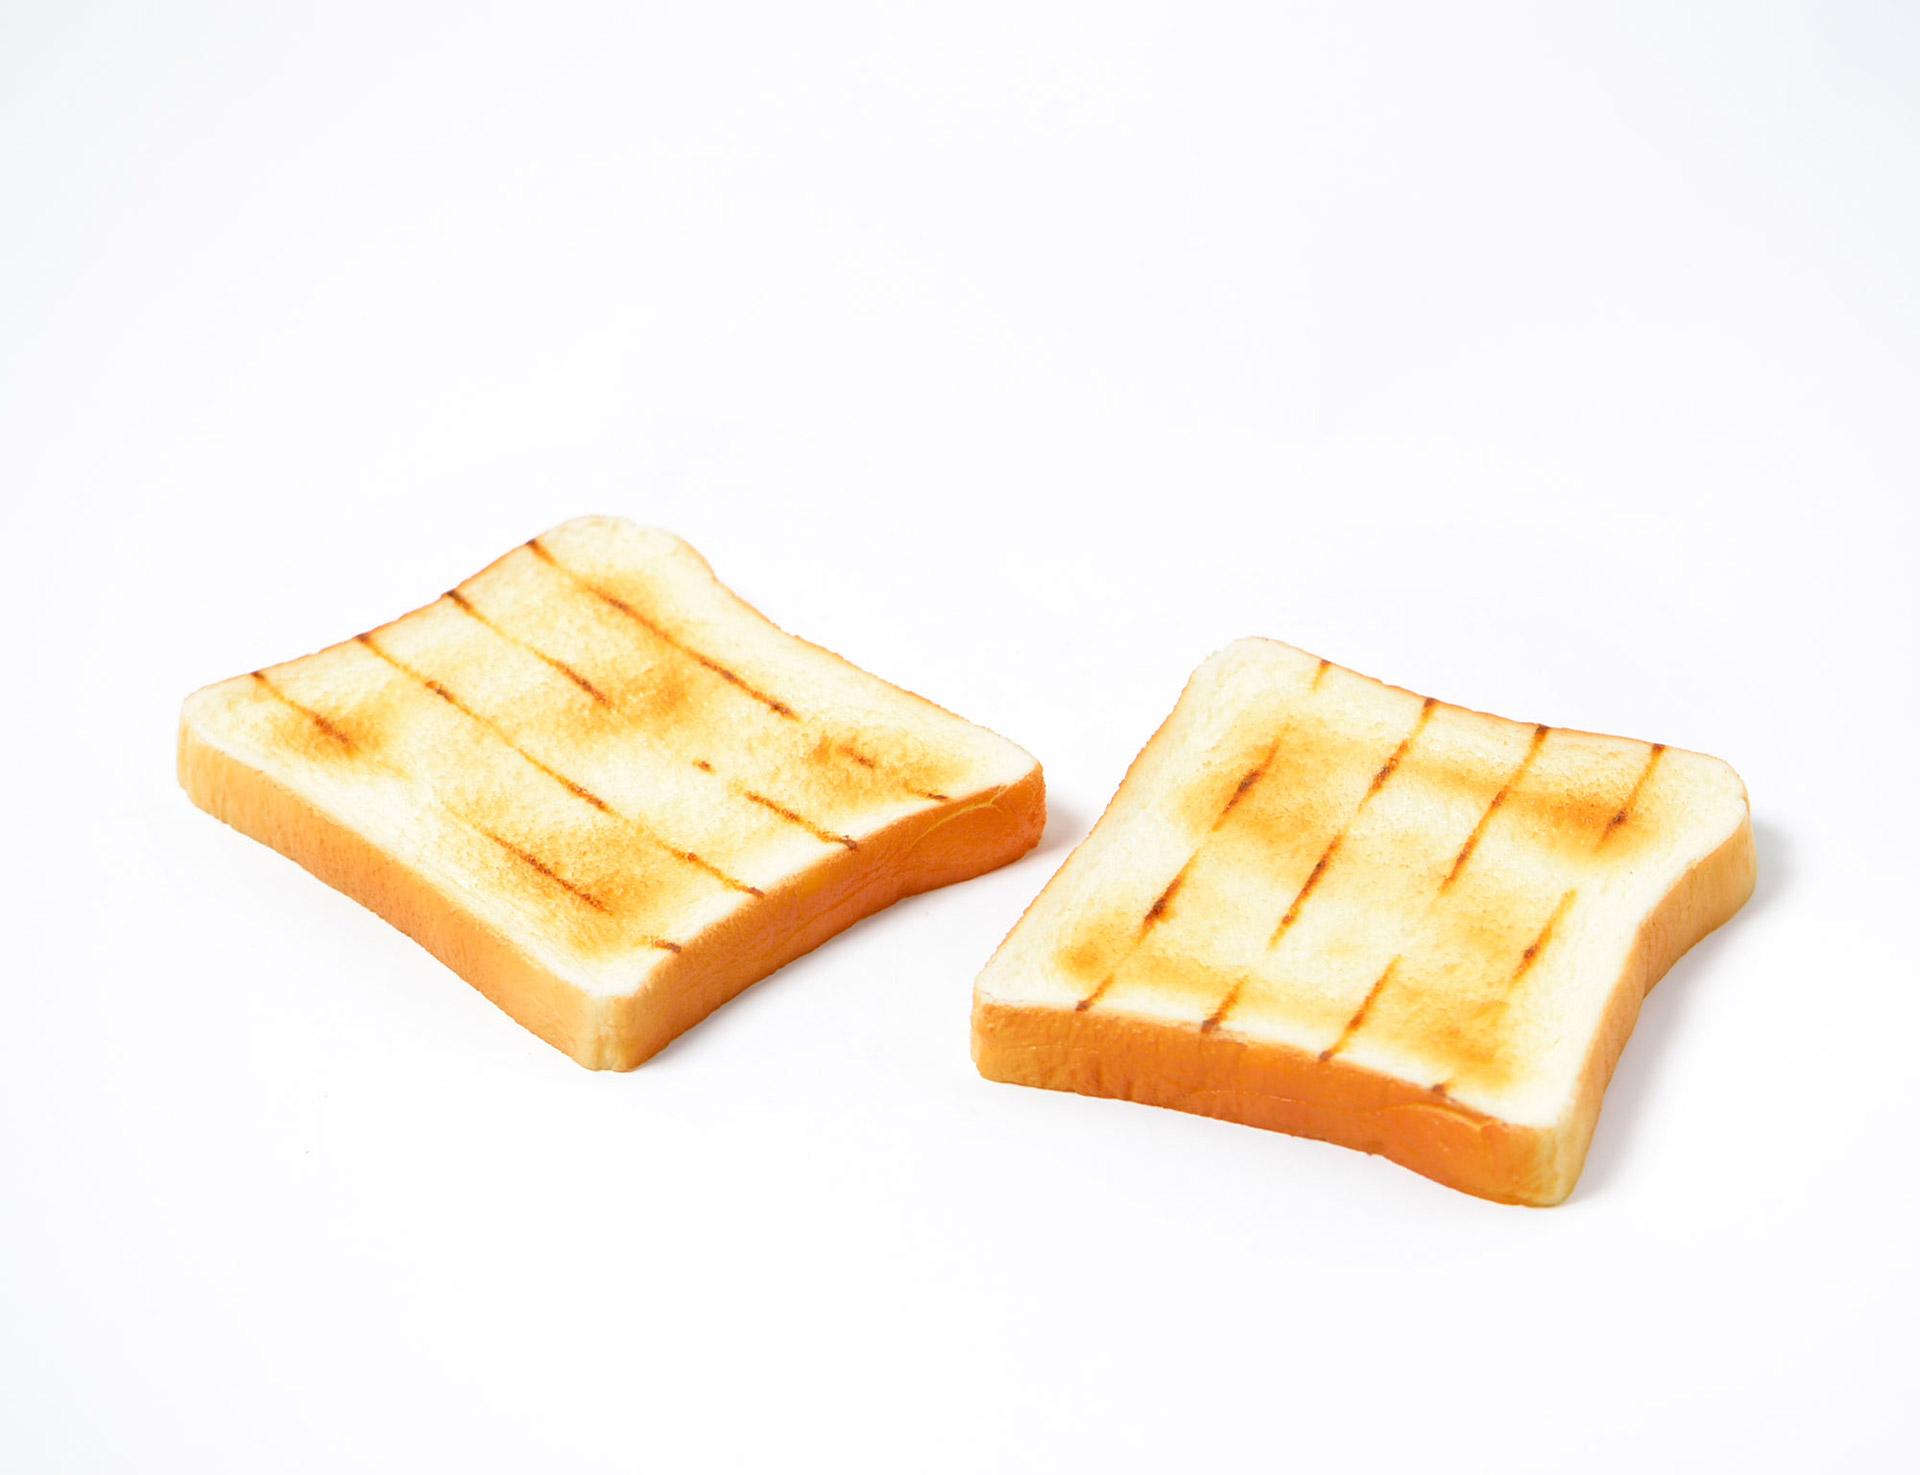 slices-of-bread.jpg